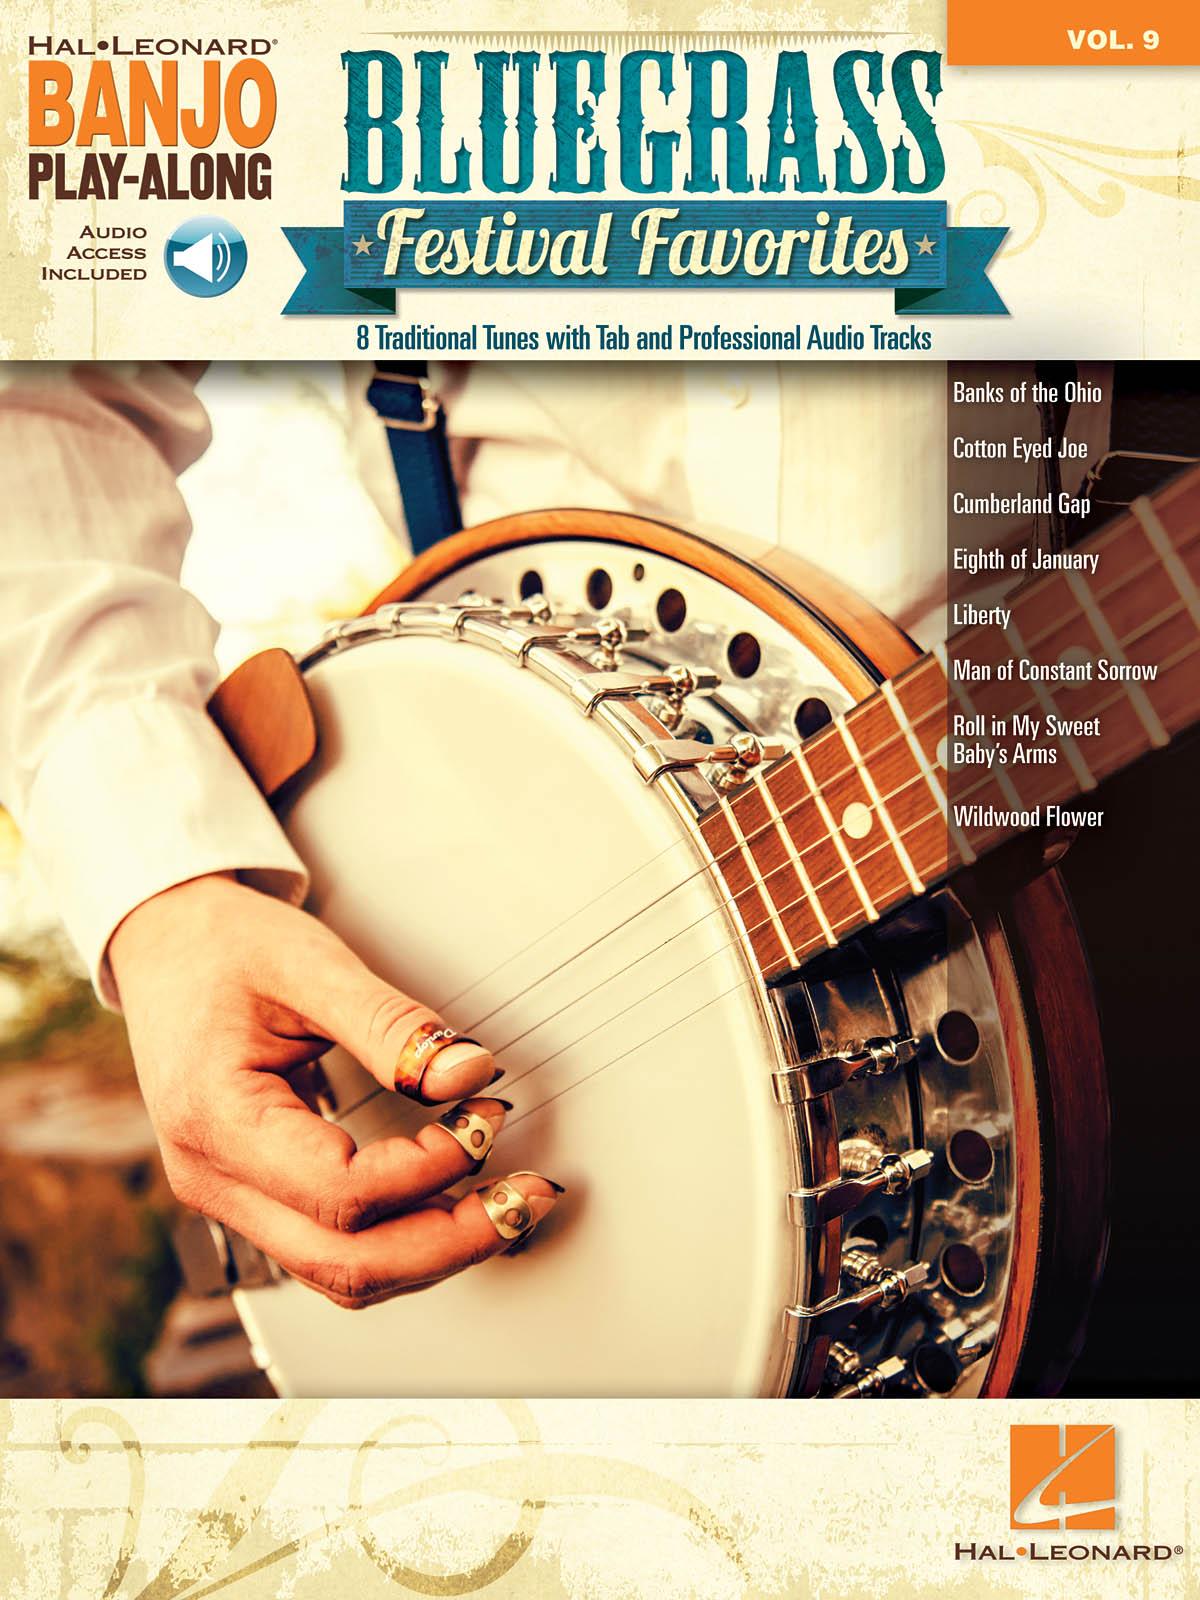 Bluegrass Festival Favorites: Banjo